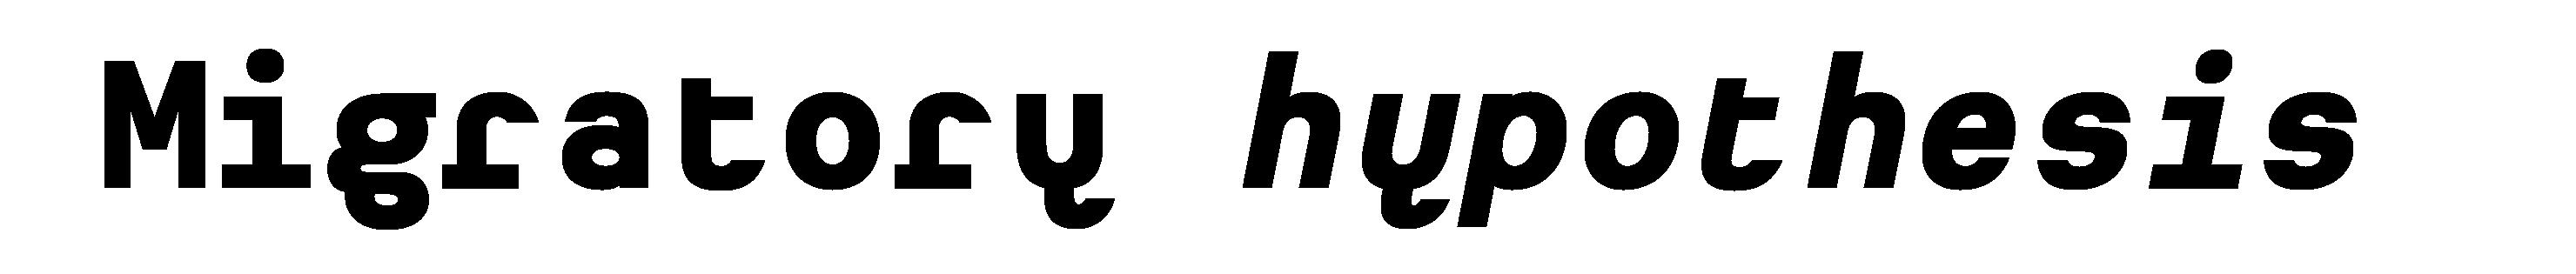 Typeface Heimat Mono D06 Atlas Font Foundry